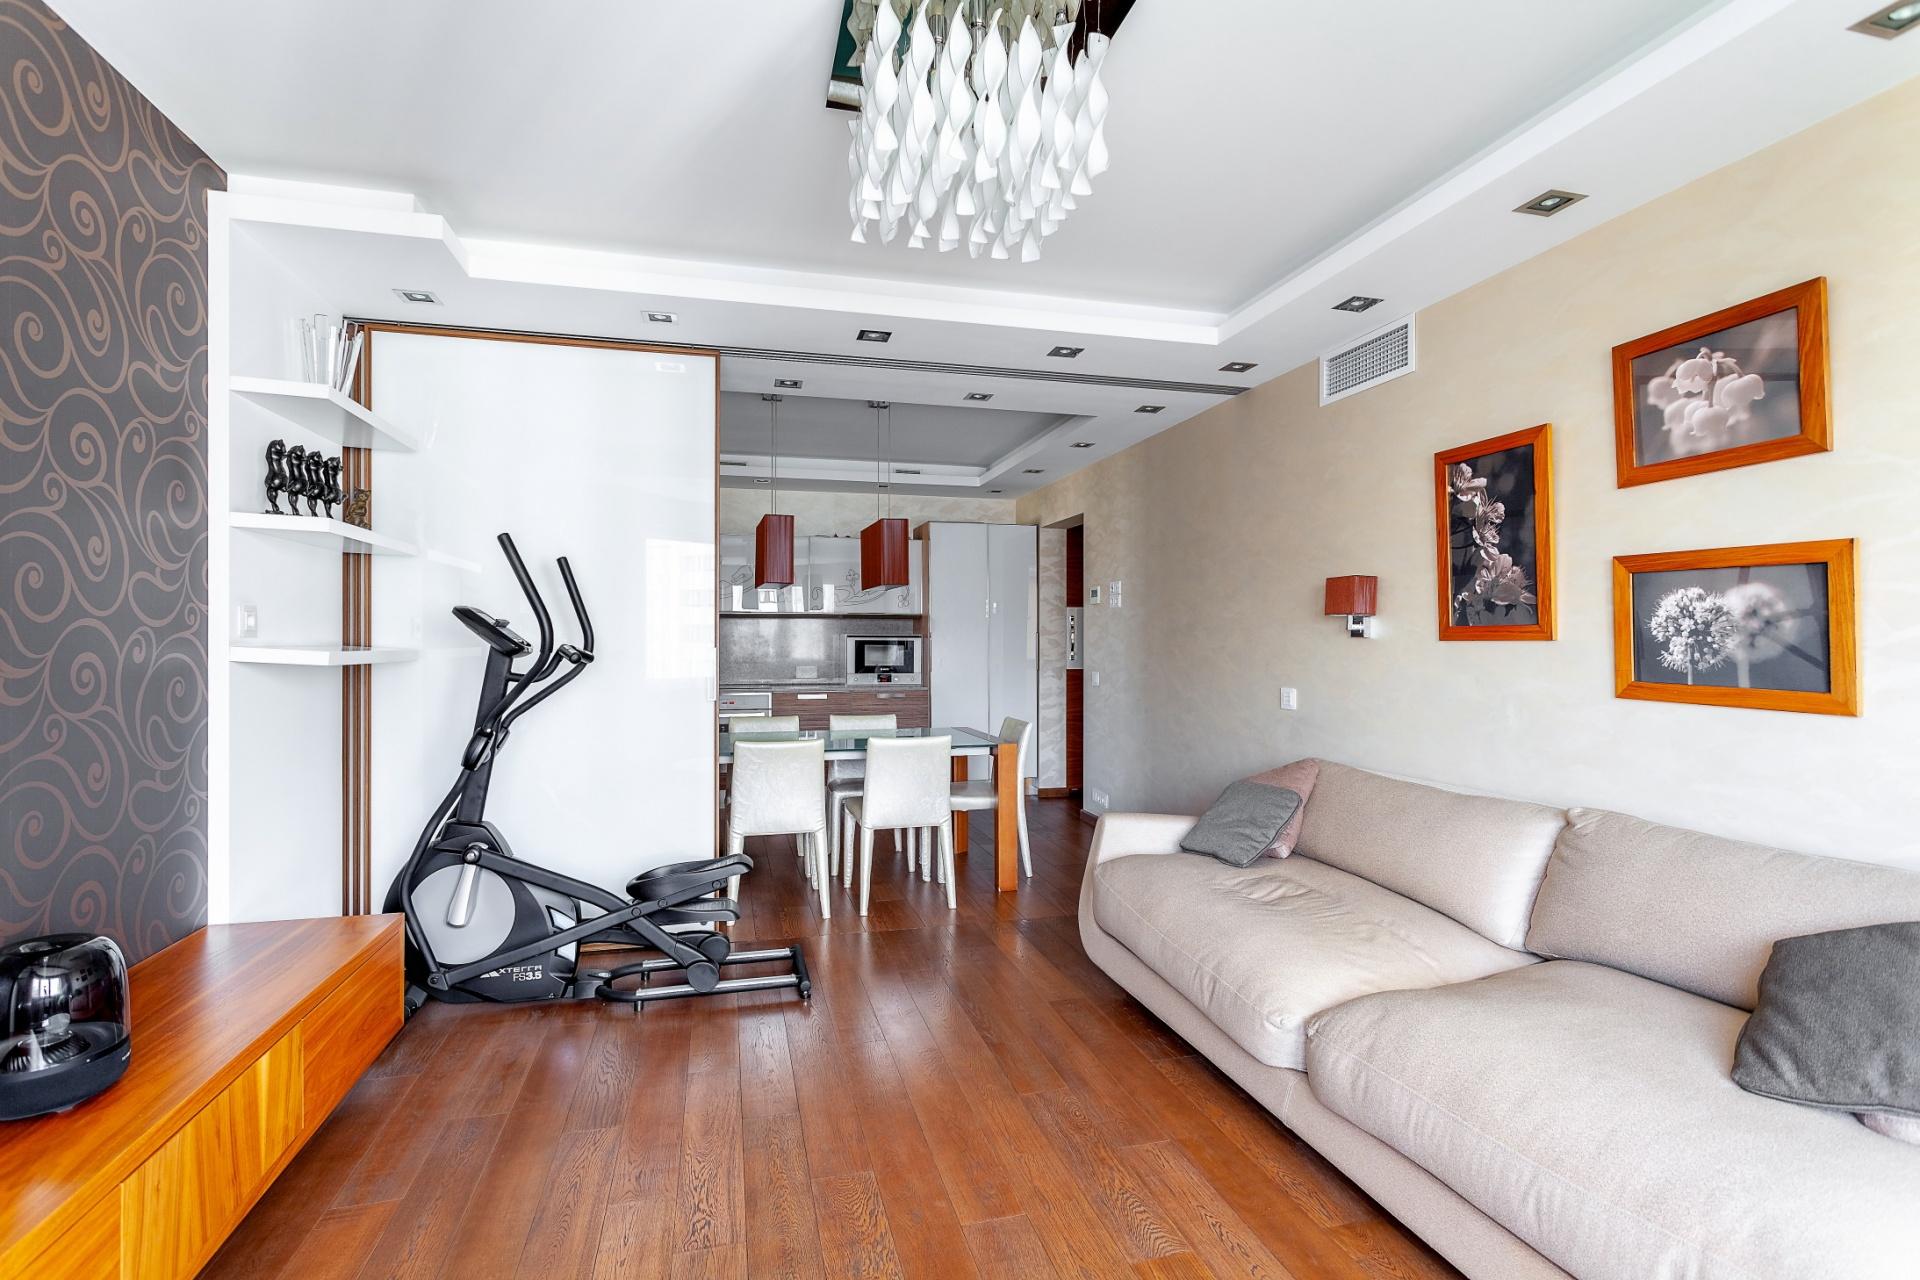 Продам трехкомнатную (3-комн.) квартиру, Коштоянца ул, 47к2, Москва г